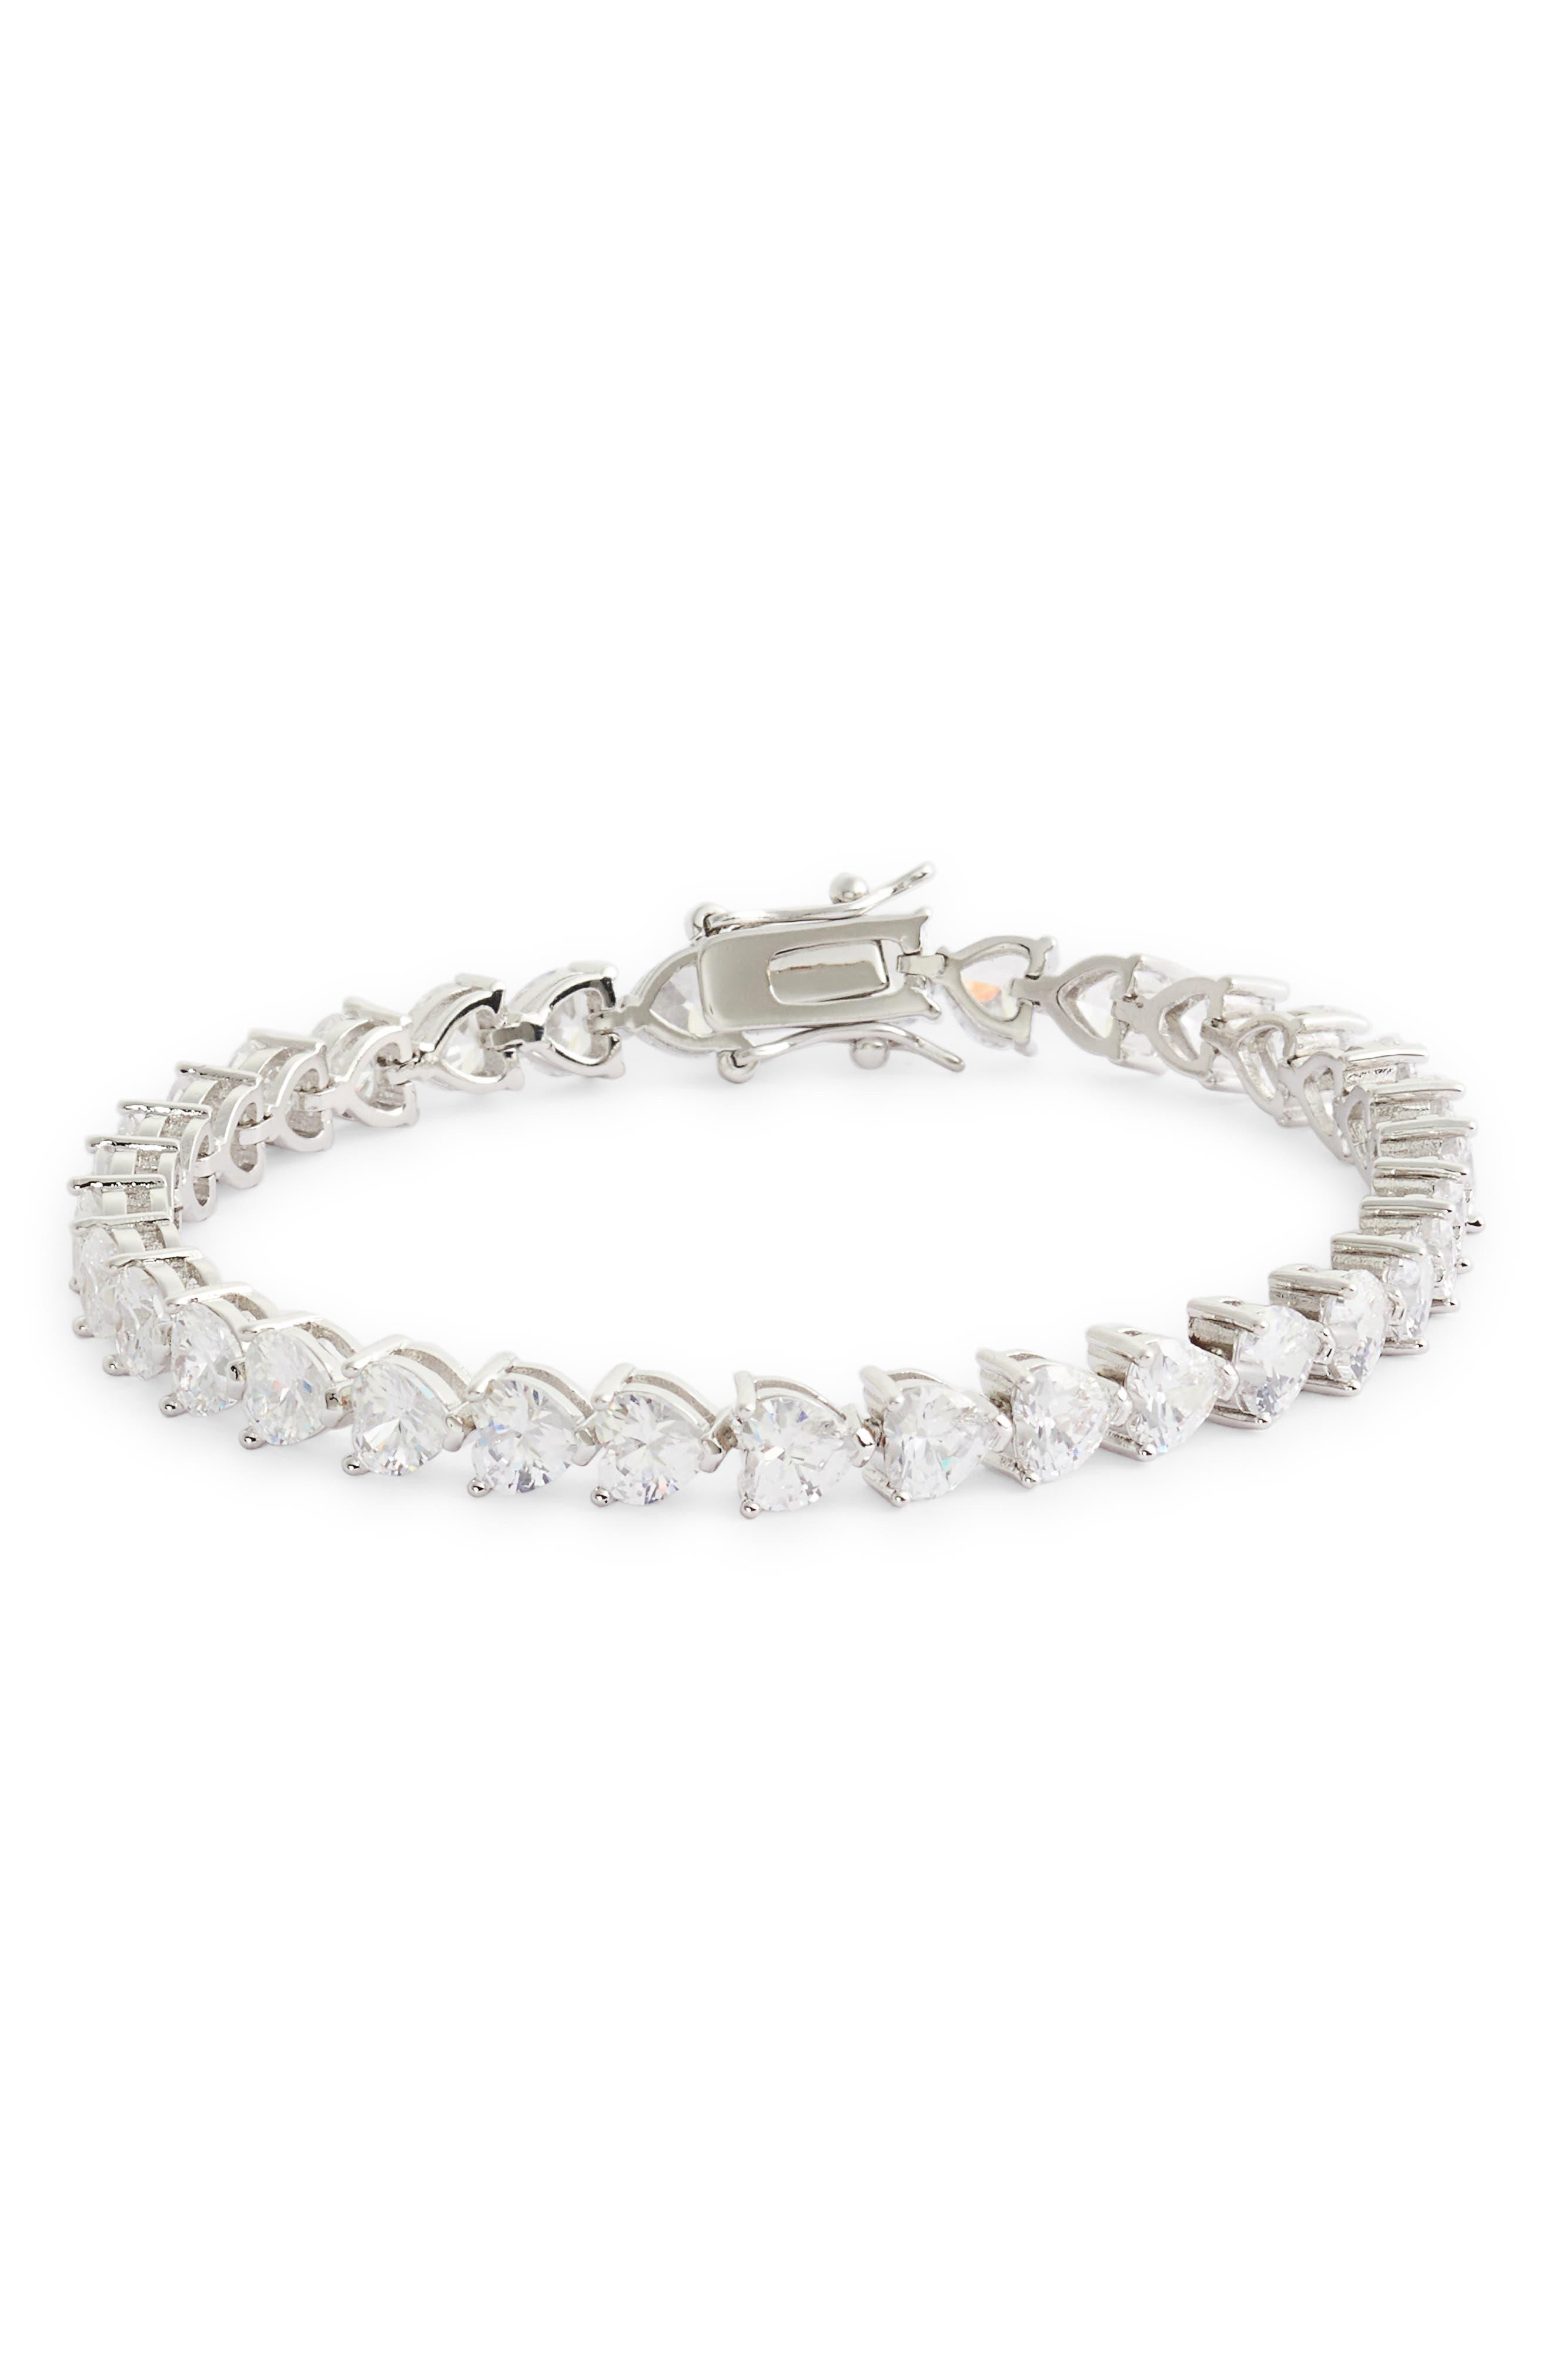 Heart Shaped Cubic Zirconia Link Bracelet,                         Main,                         color, WHITE/ SILVER